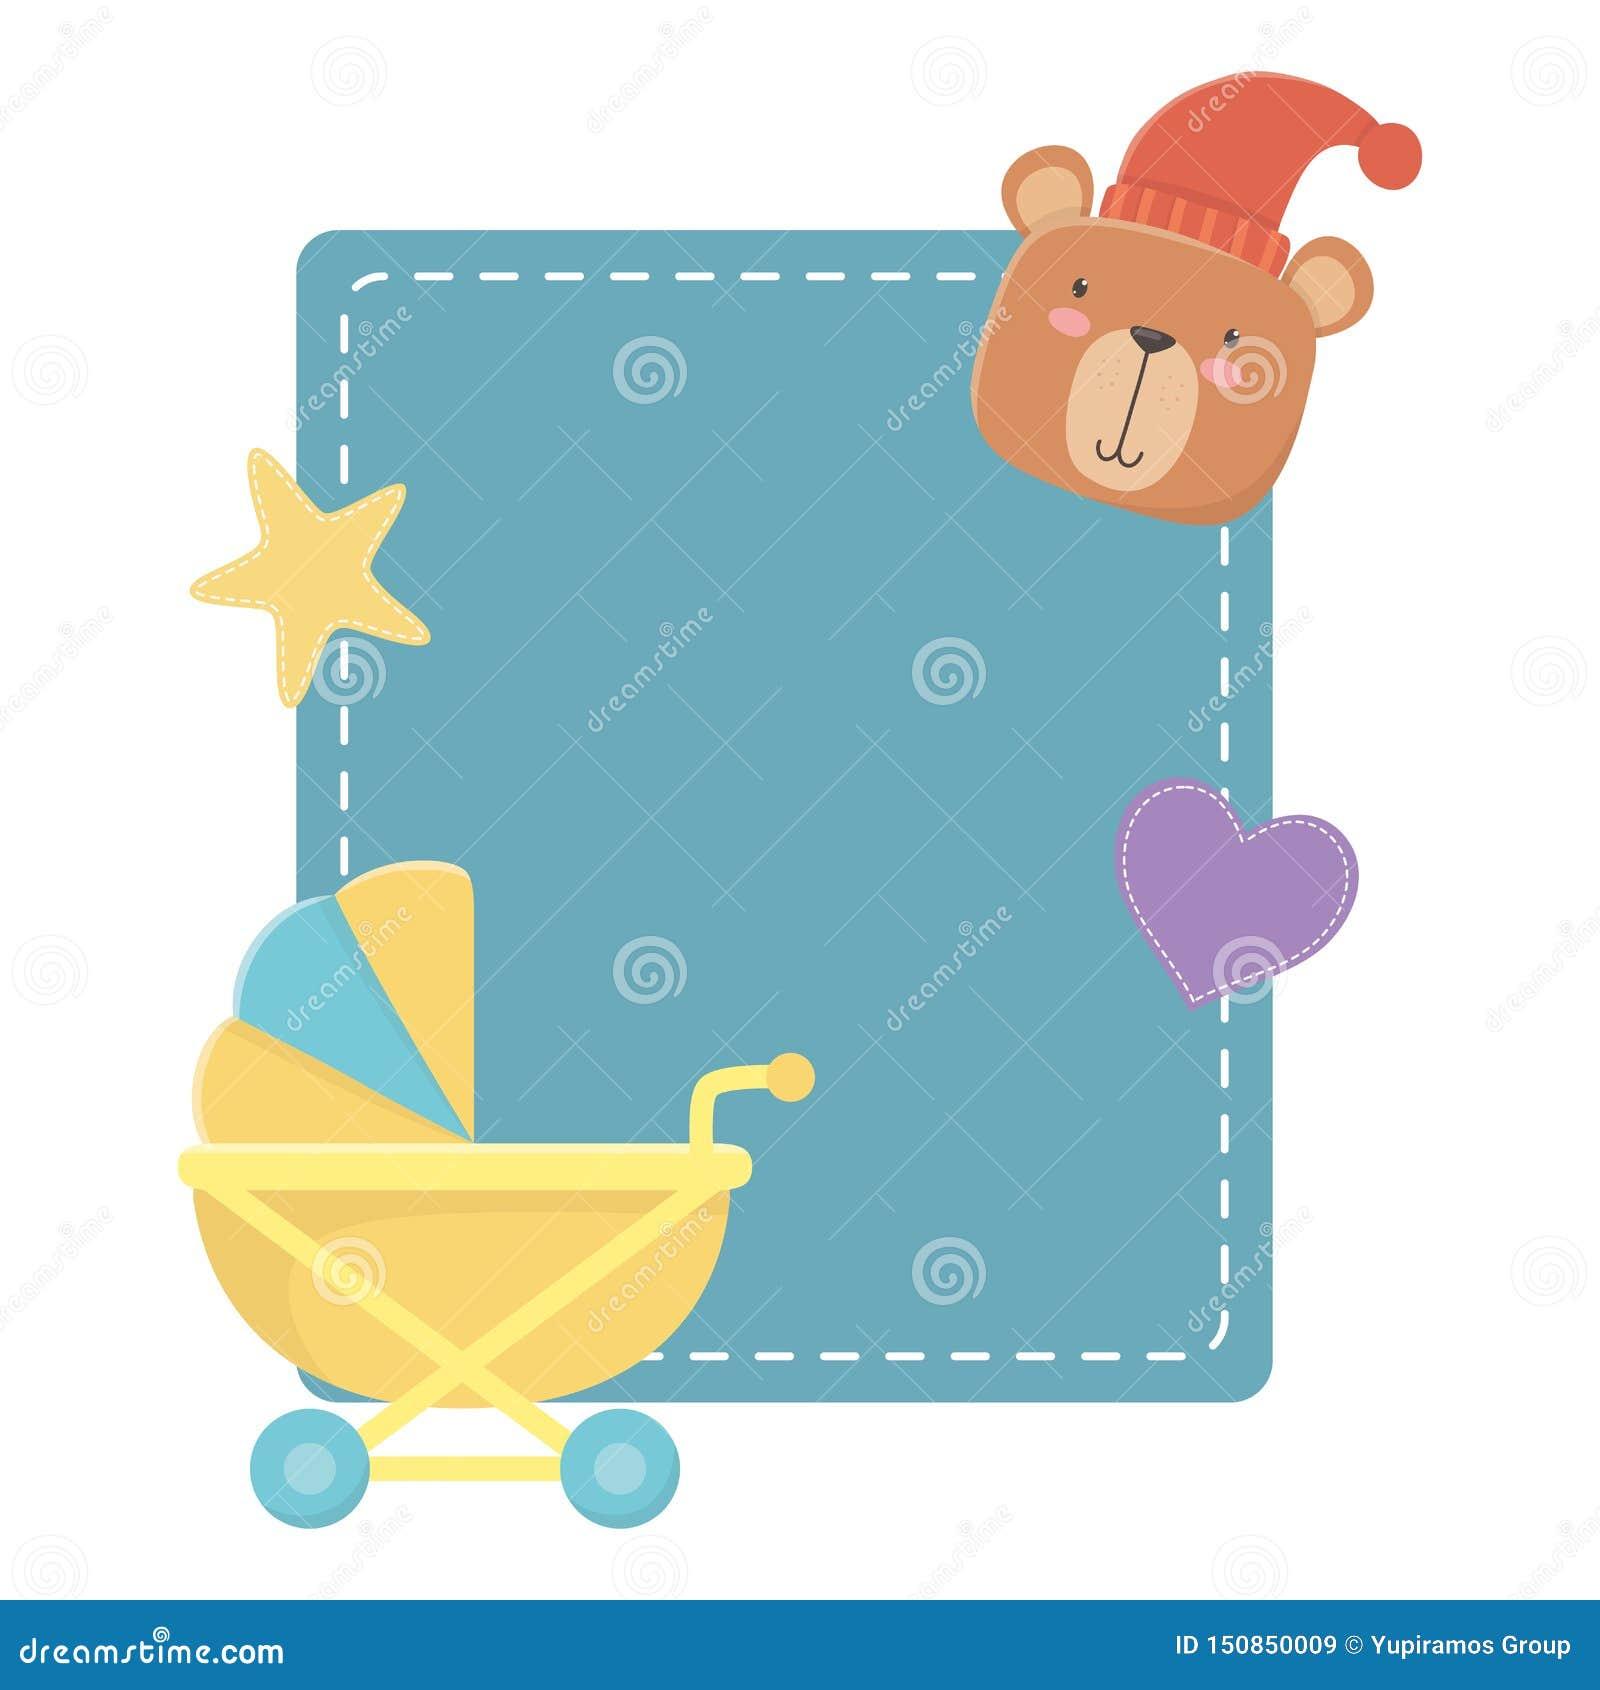 Baby stroller and teddy bear design